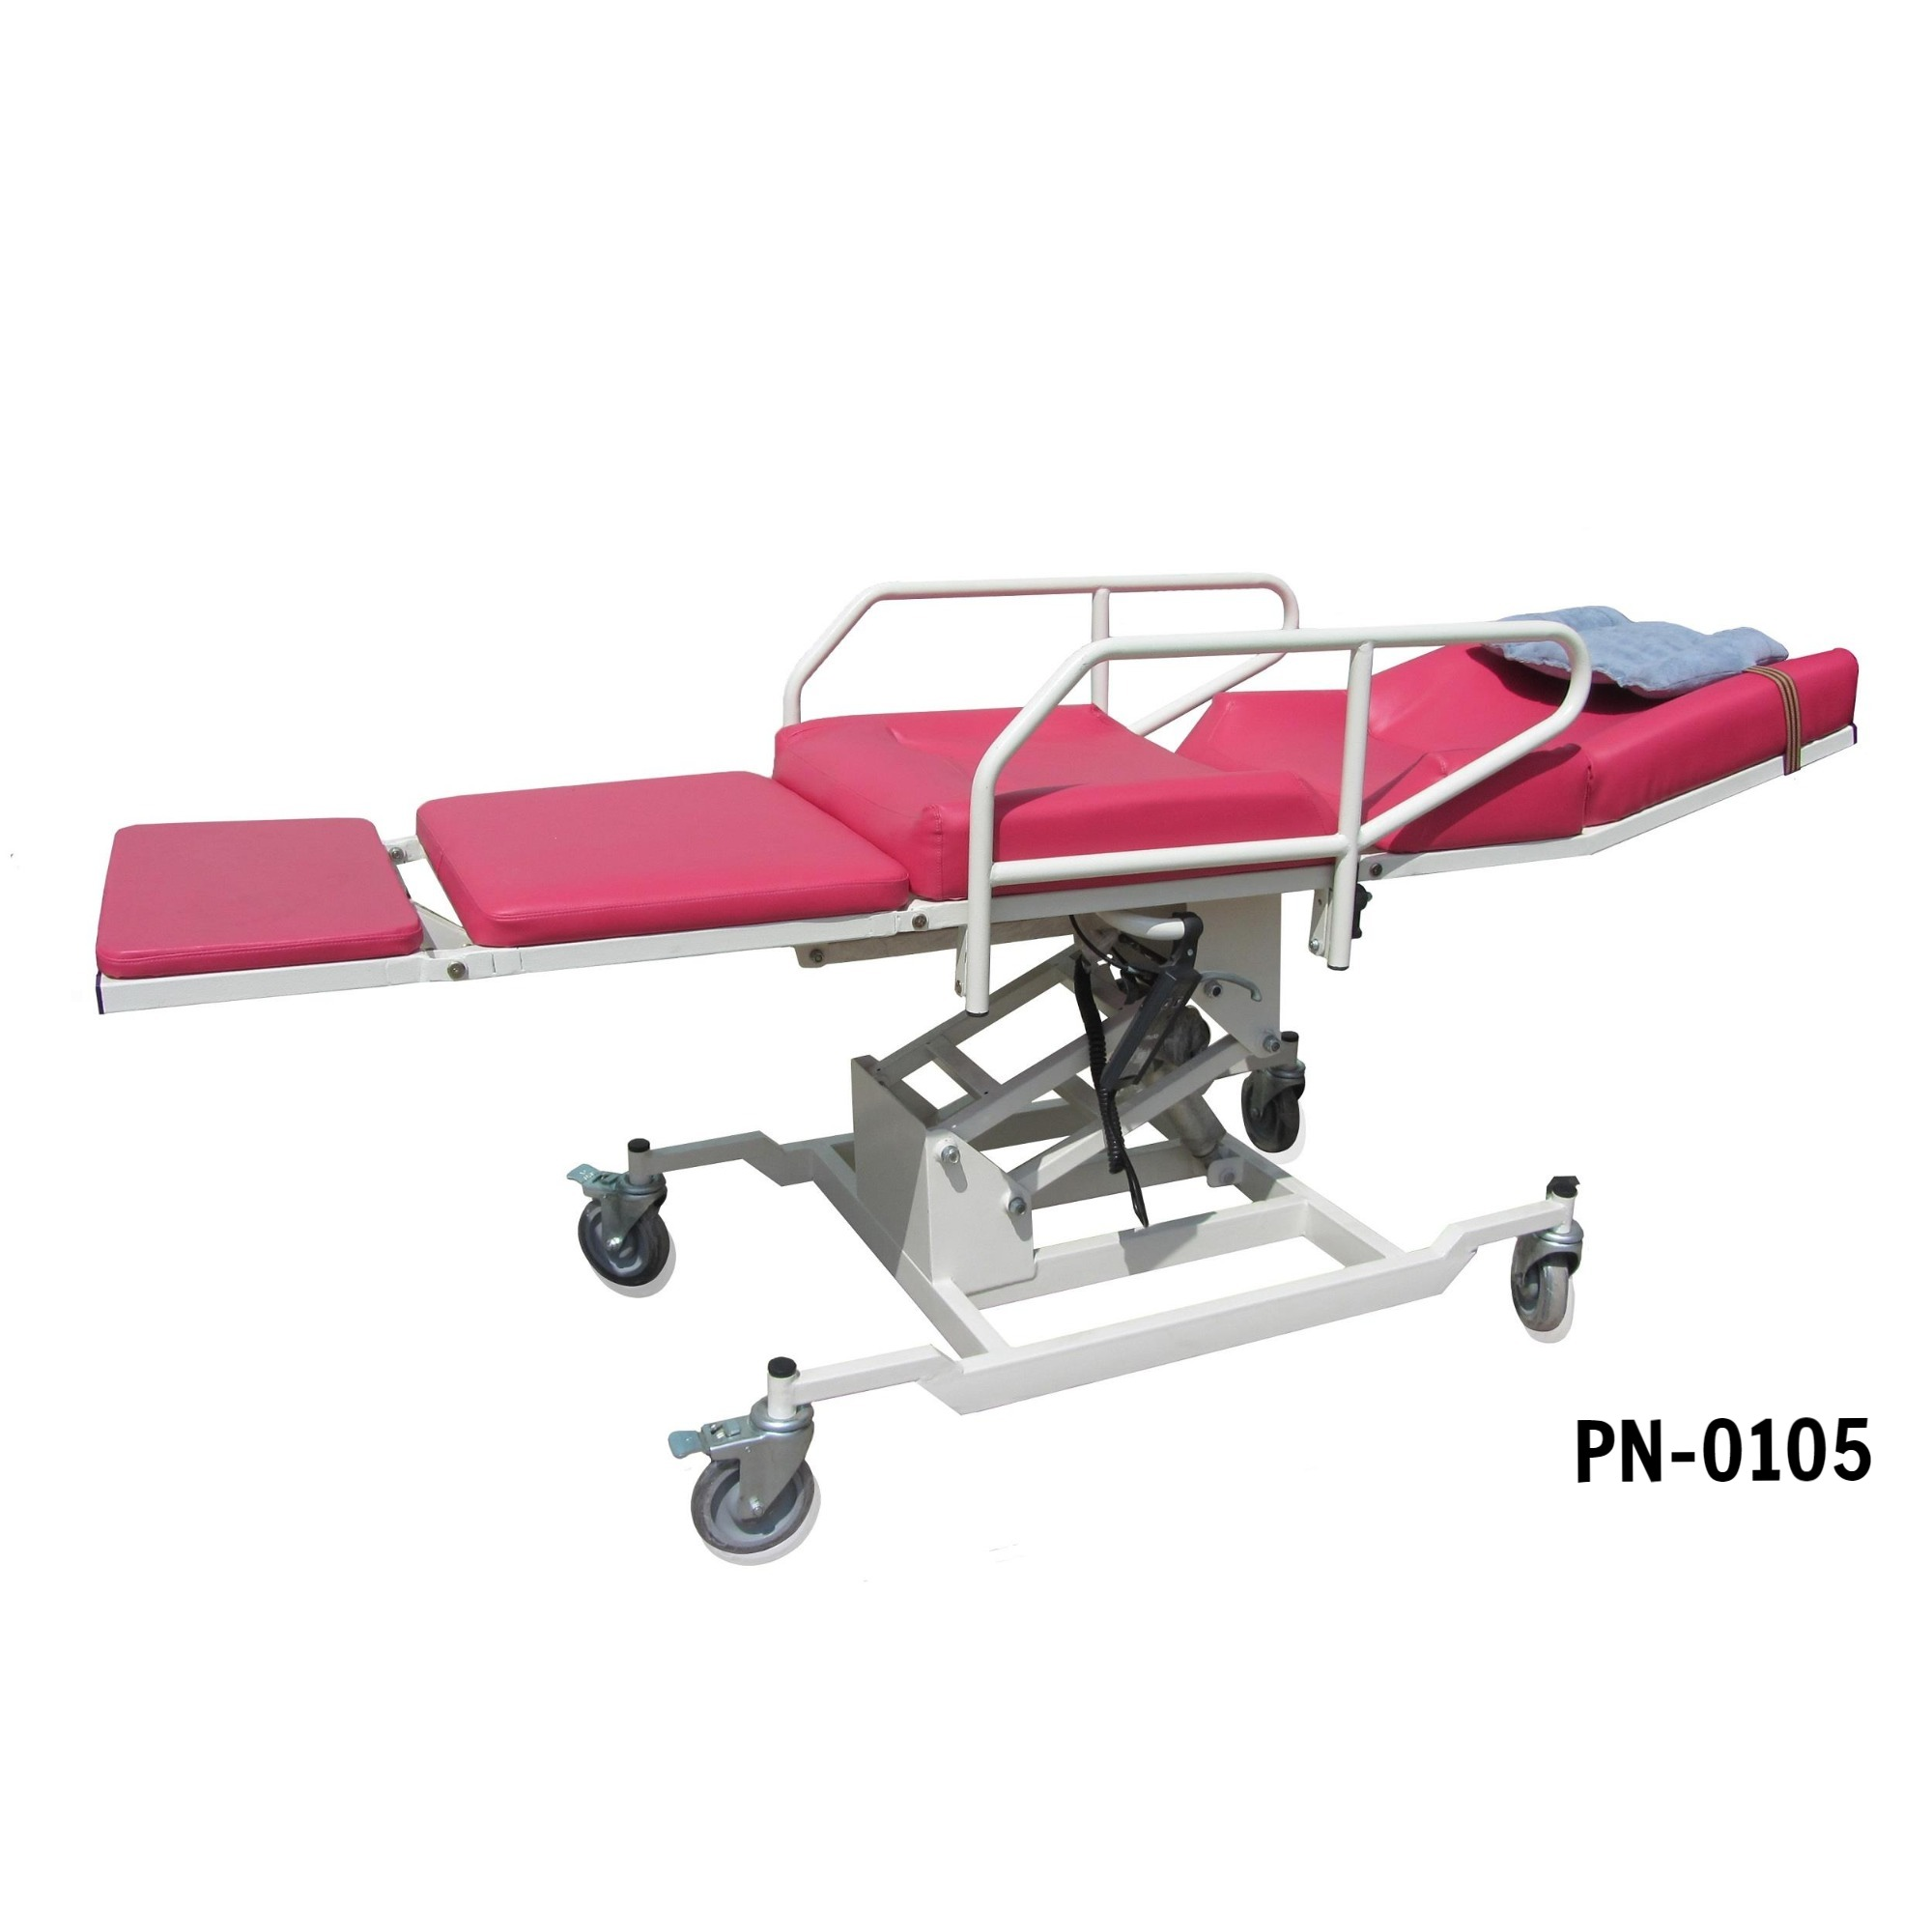 PN-0105 - Ghế - Giường y tế